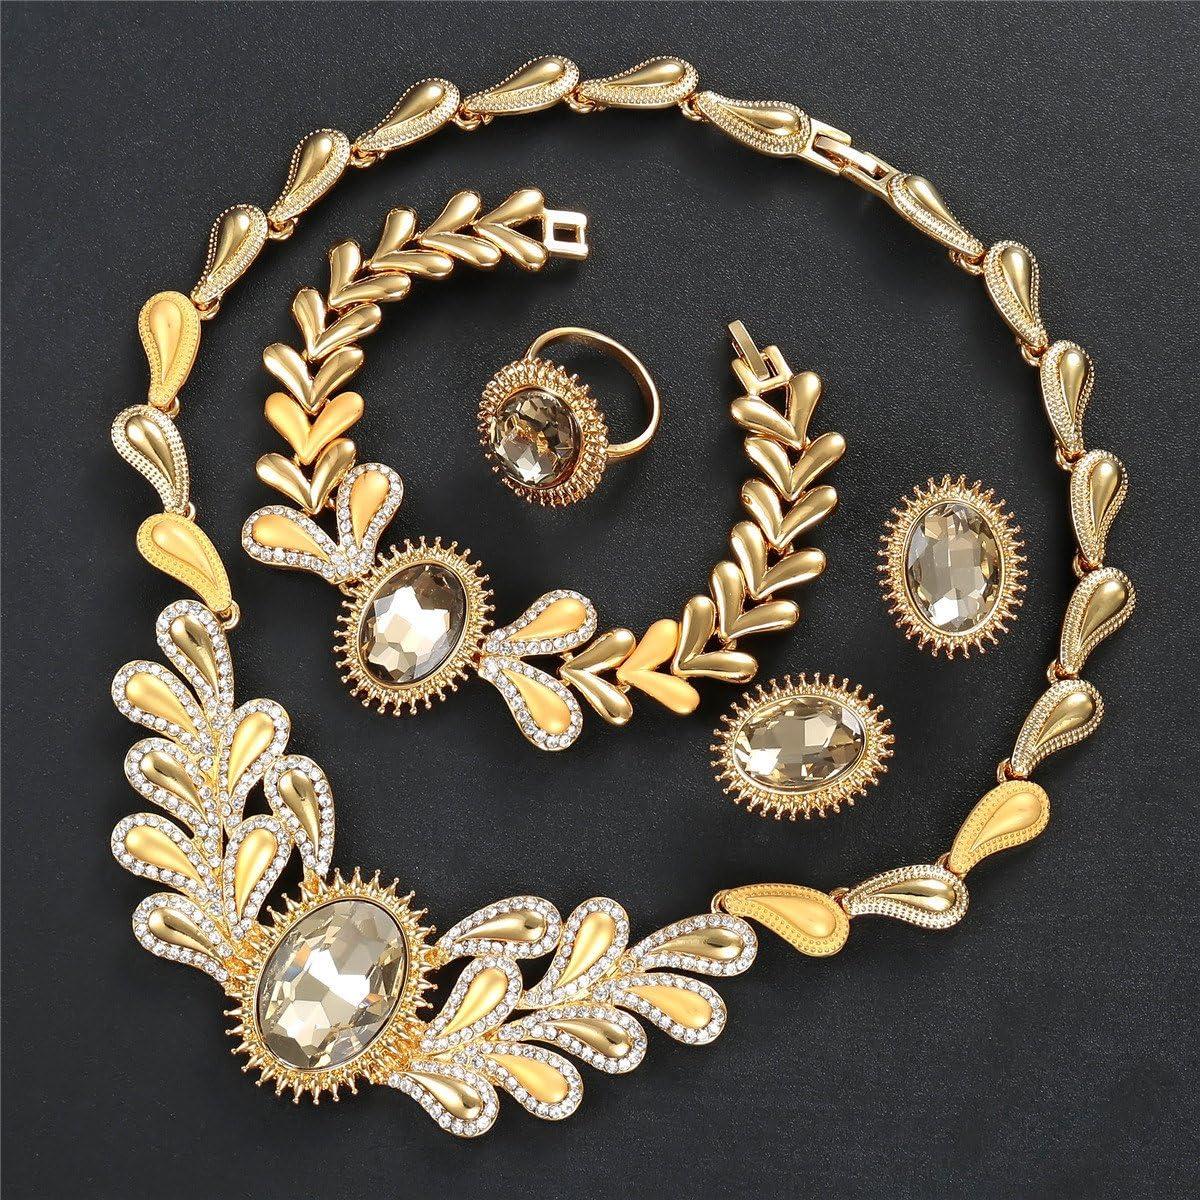 IFFURMON Bridal Crystal African Beads Jewelry Set Gold Color Fashion Dubai Women Jewelry Sets